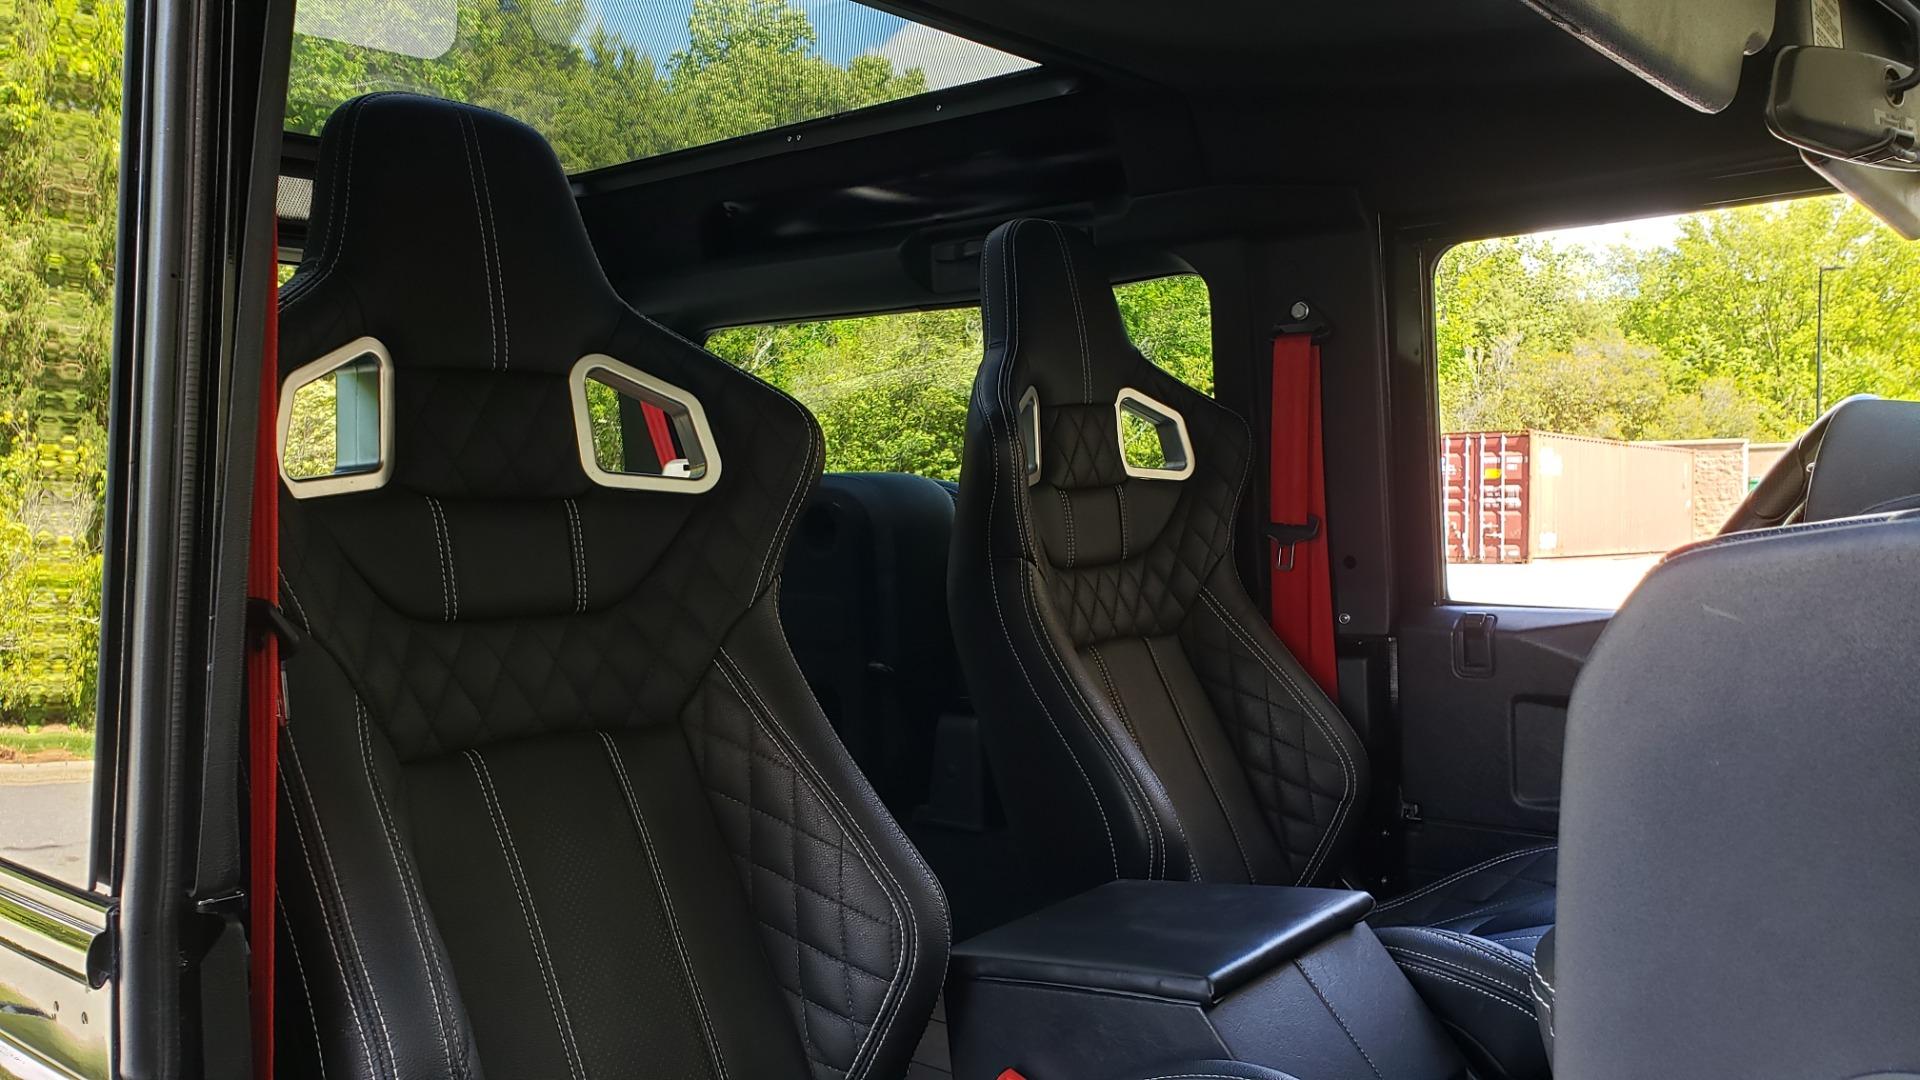 Used 1985 Land Rover DEFENDER 90 4X4 CUSTOM RESTORED 5.3L LS V8 for sale Sold at Formula Imports in Charlotte NC 28227 44